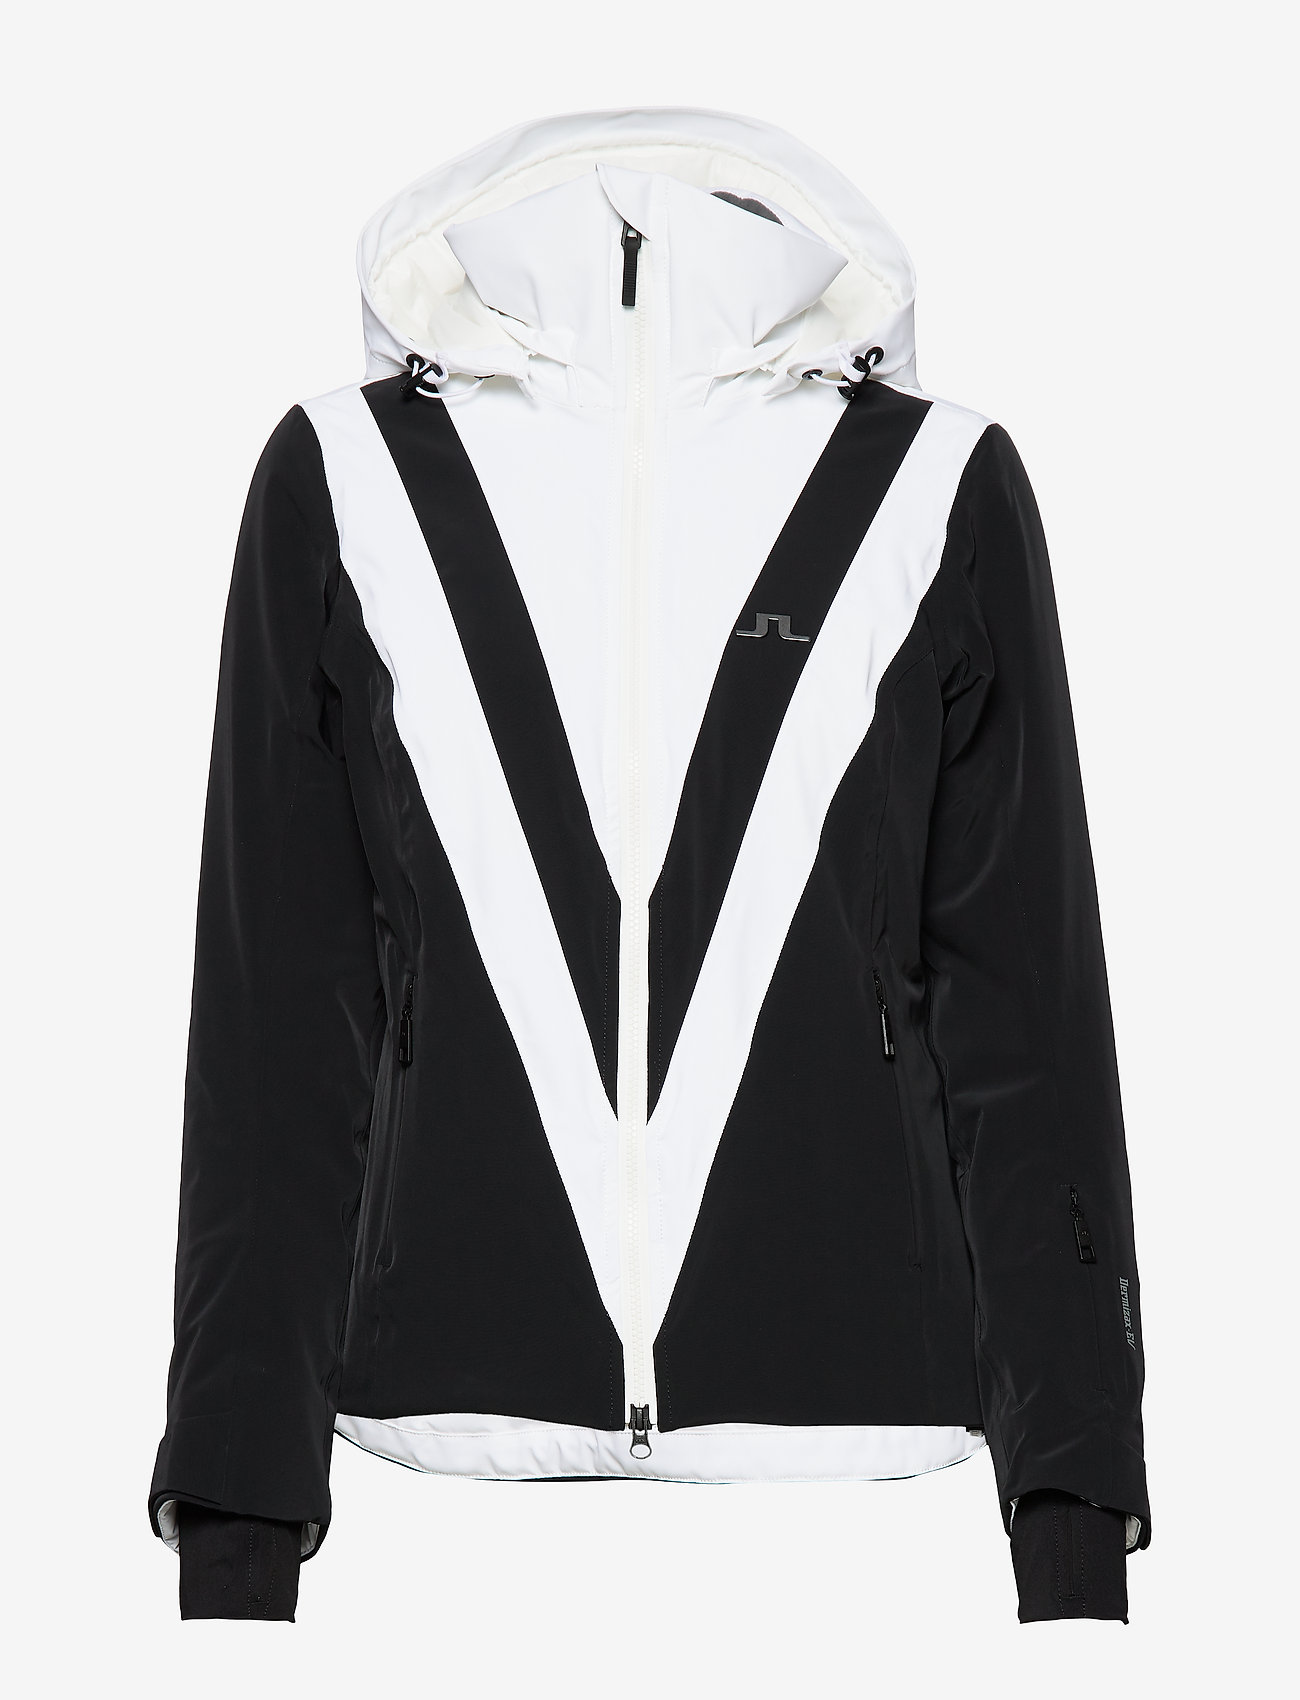 J. Lindeberg Ski - W Wrangell Jkt-Dermizax EV 2L - insulated jackets - black - 1